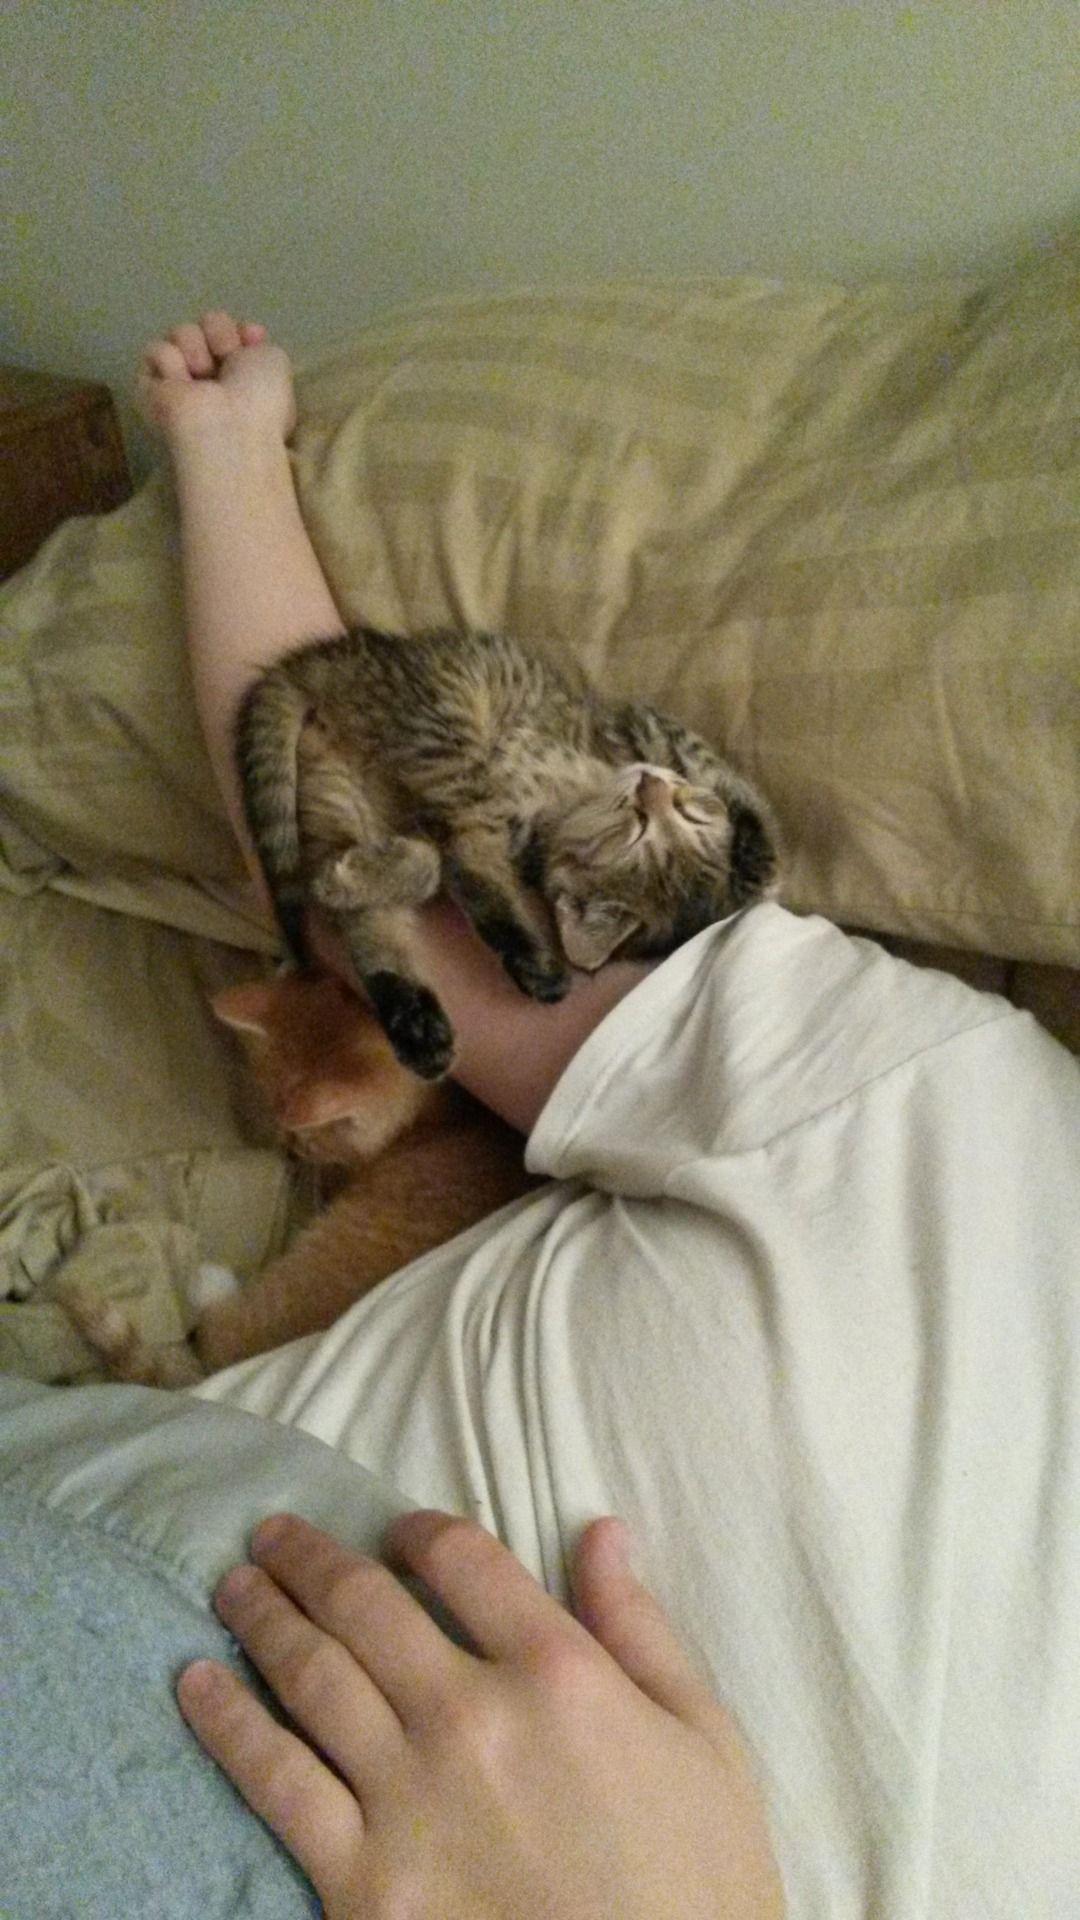 Awwww Cute My Kitten Fell Off My Pillow But Kept Napping Away Cats Kittens Crazy Cats